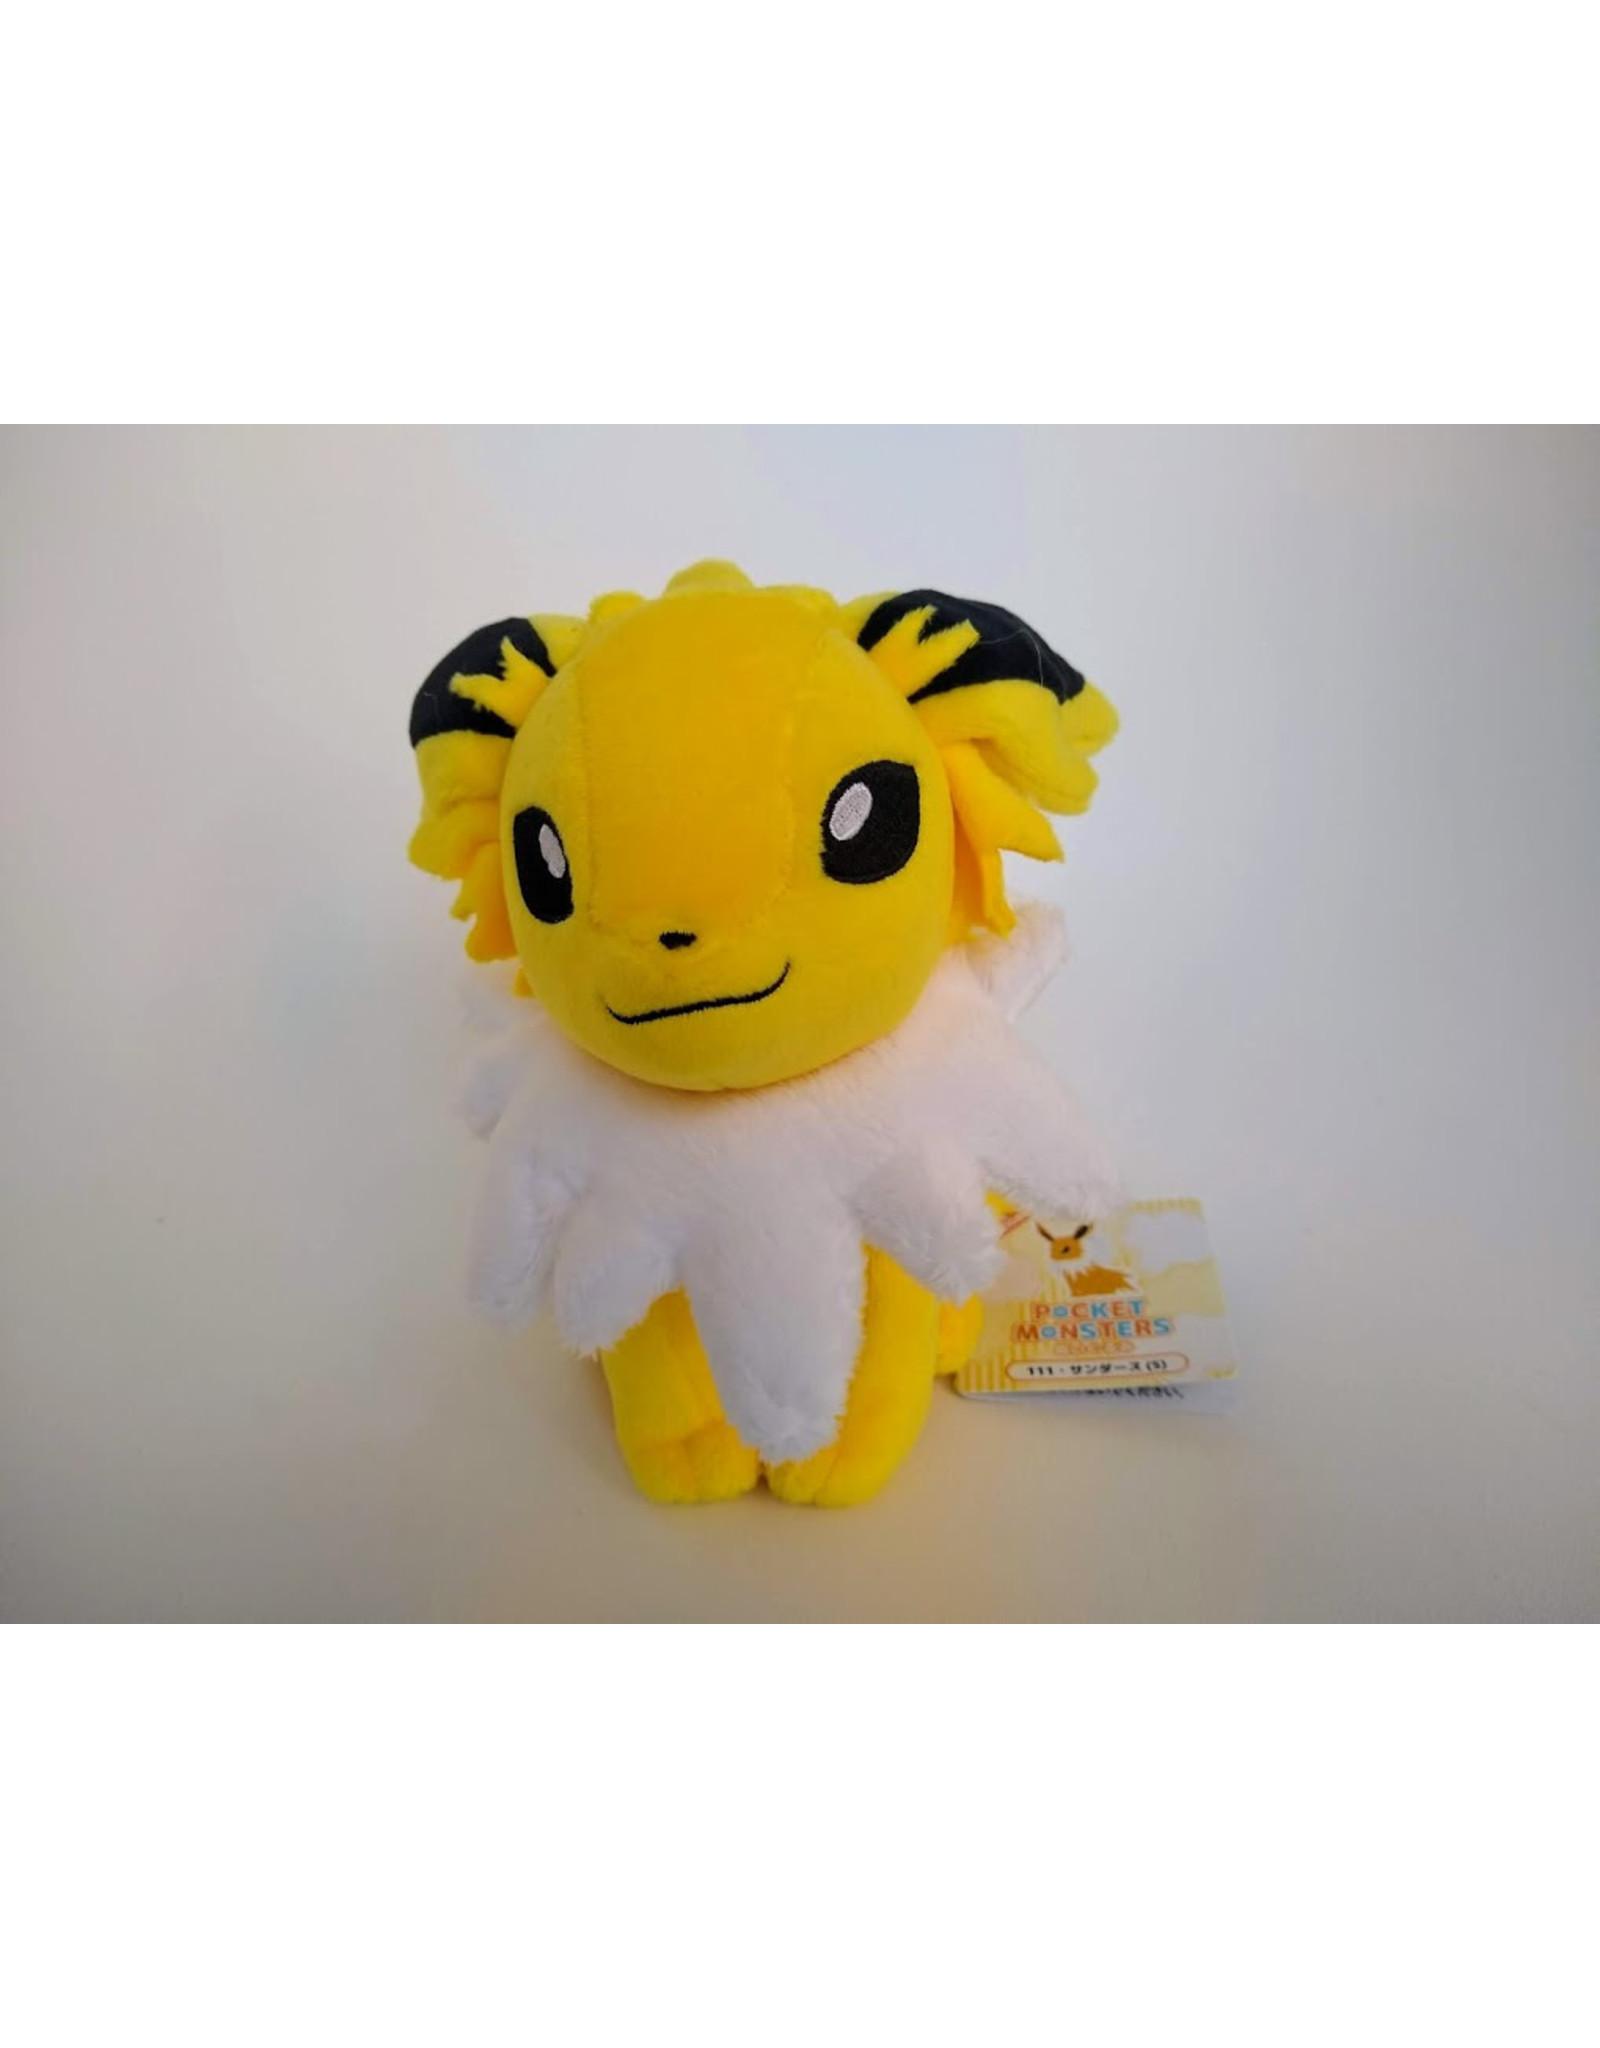 Jolteon - Pokemon Plushie - 20cm (Japanese import)